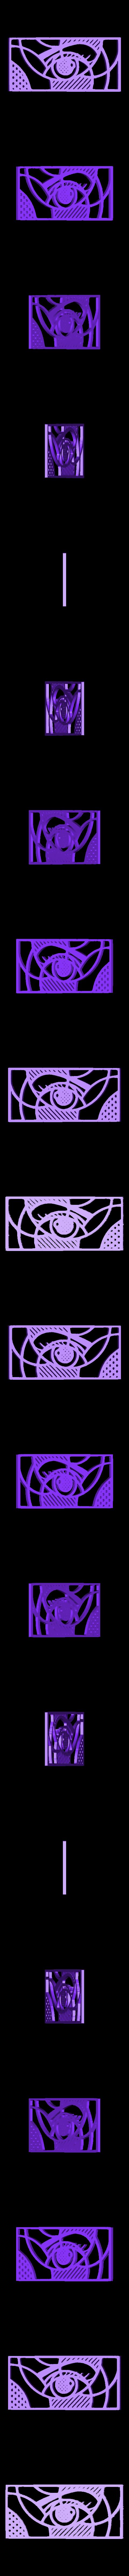 muraleye.stl Download free STL file Eye Wall Sculpture 2D • 3D printing template, UnpredictableLab